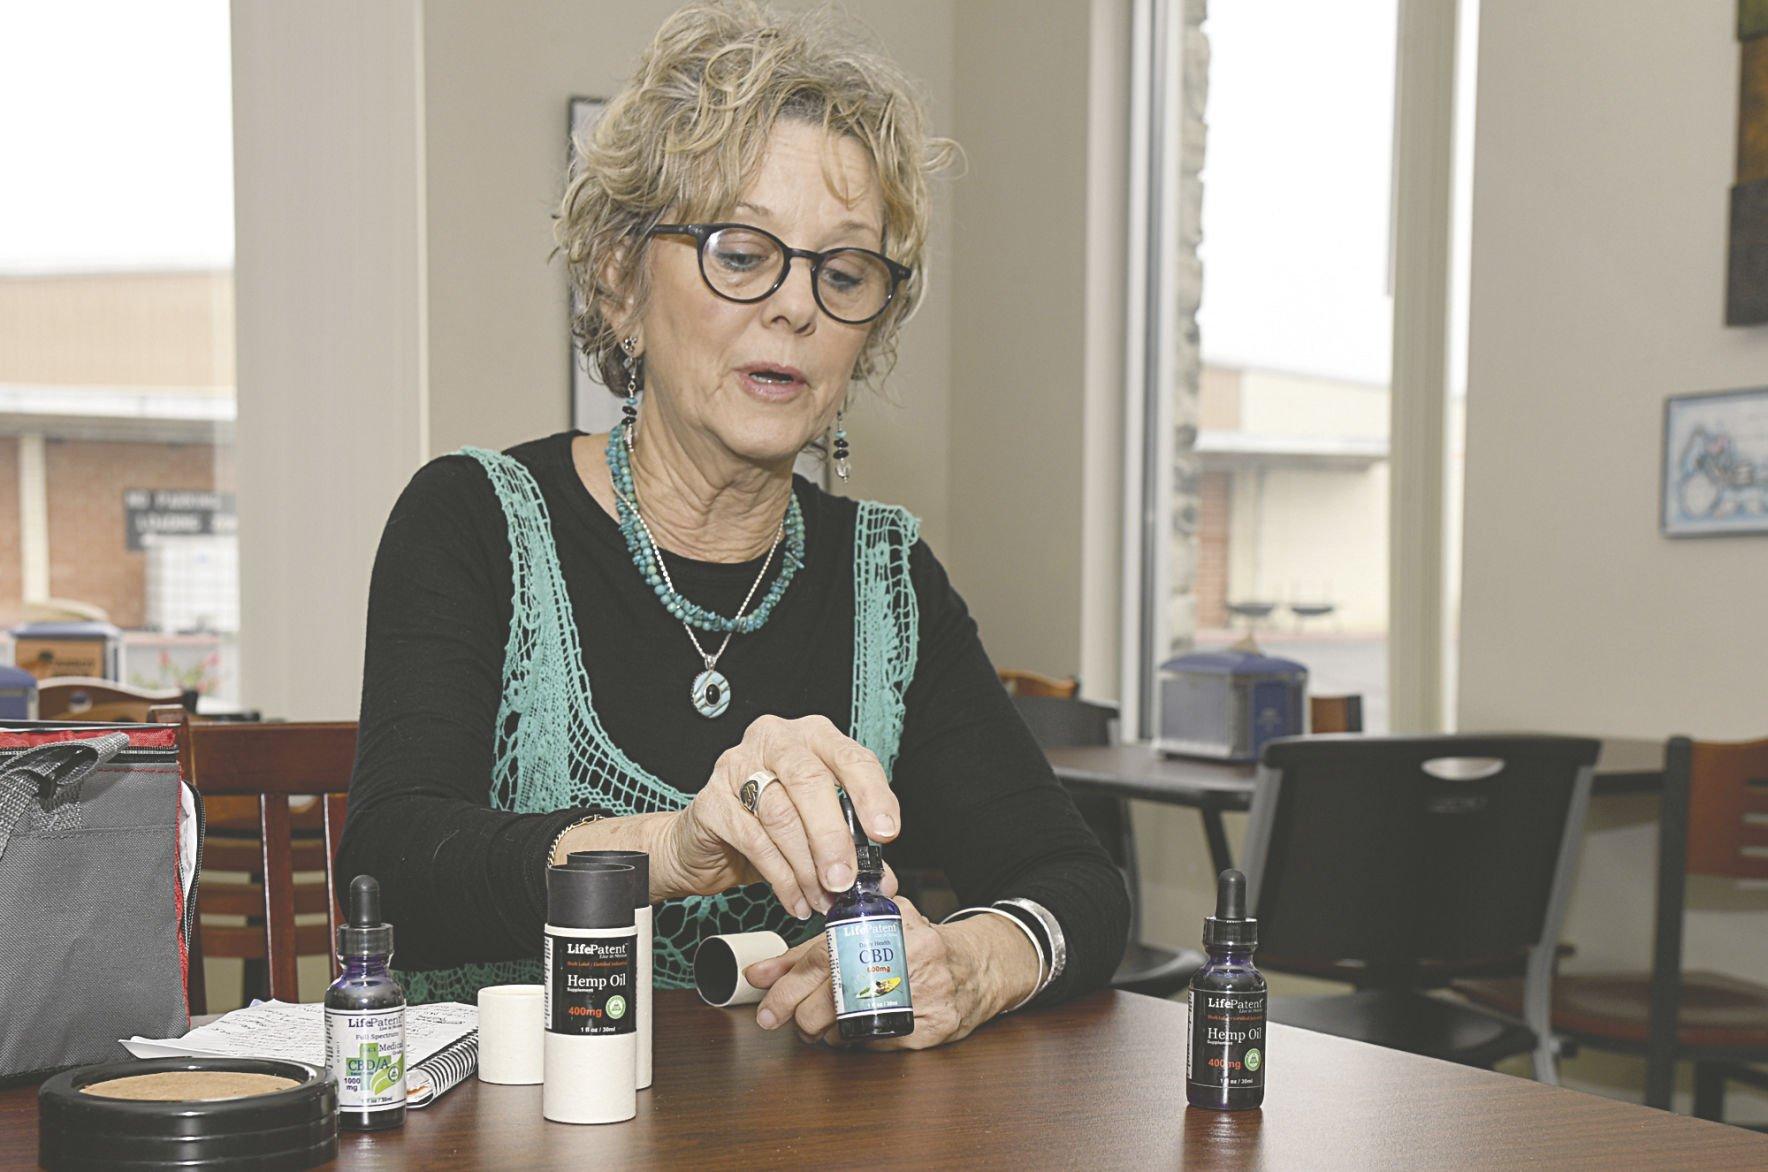 cbd oil indiana drug test